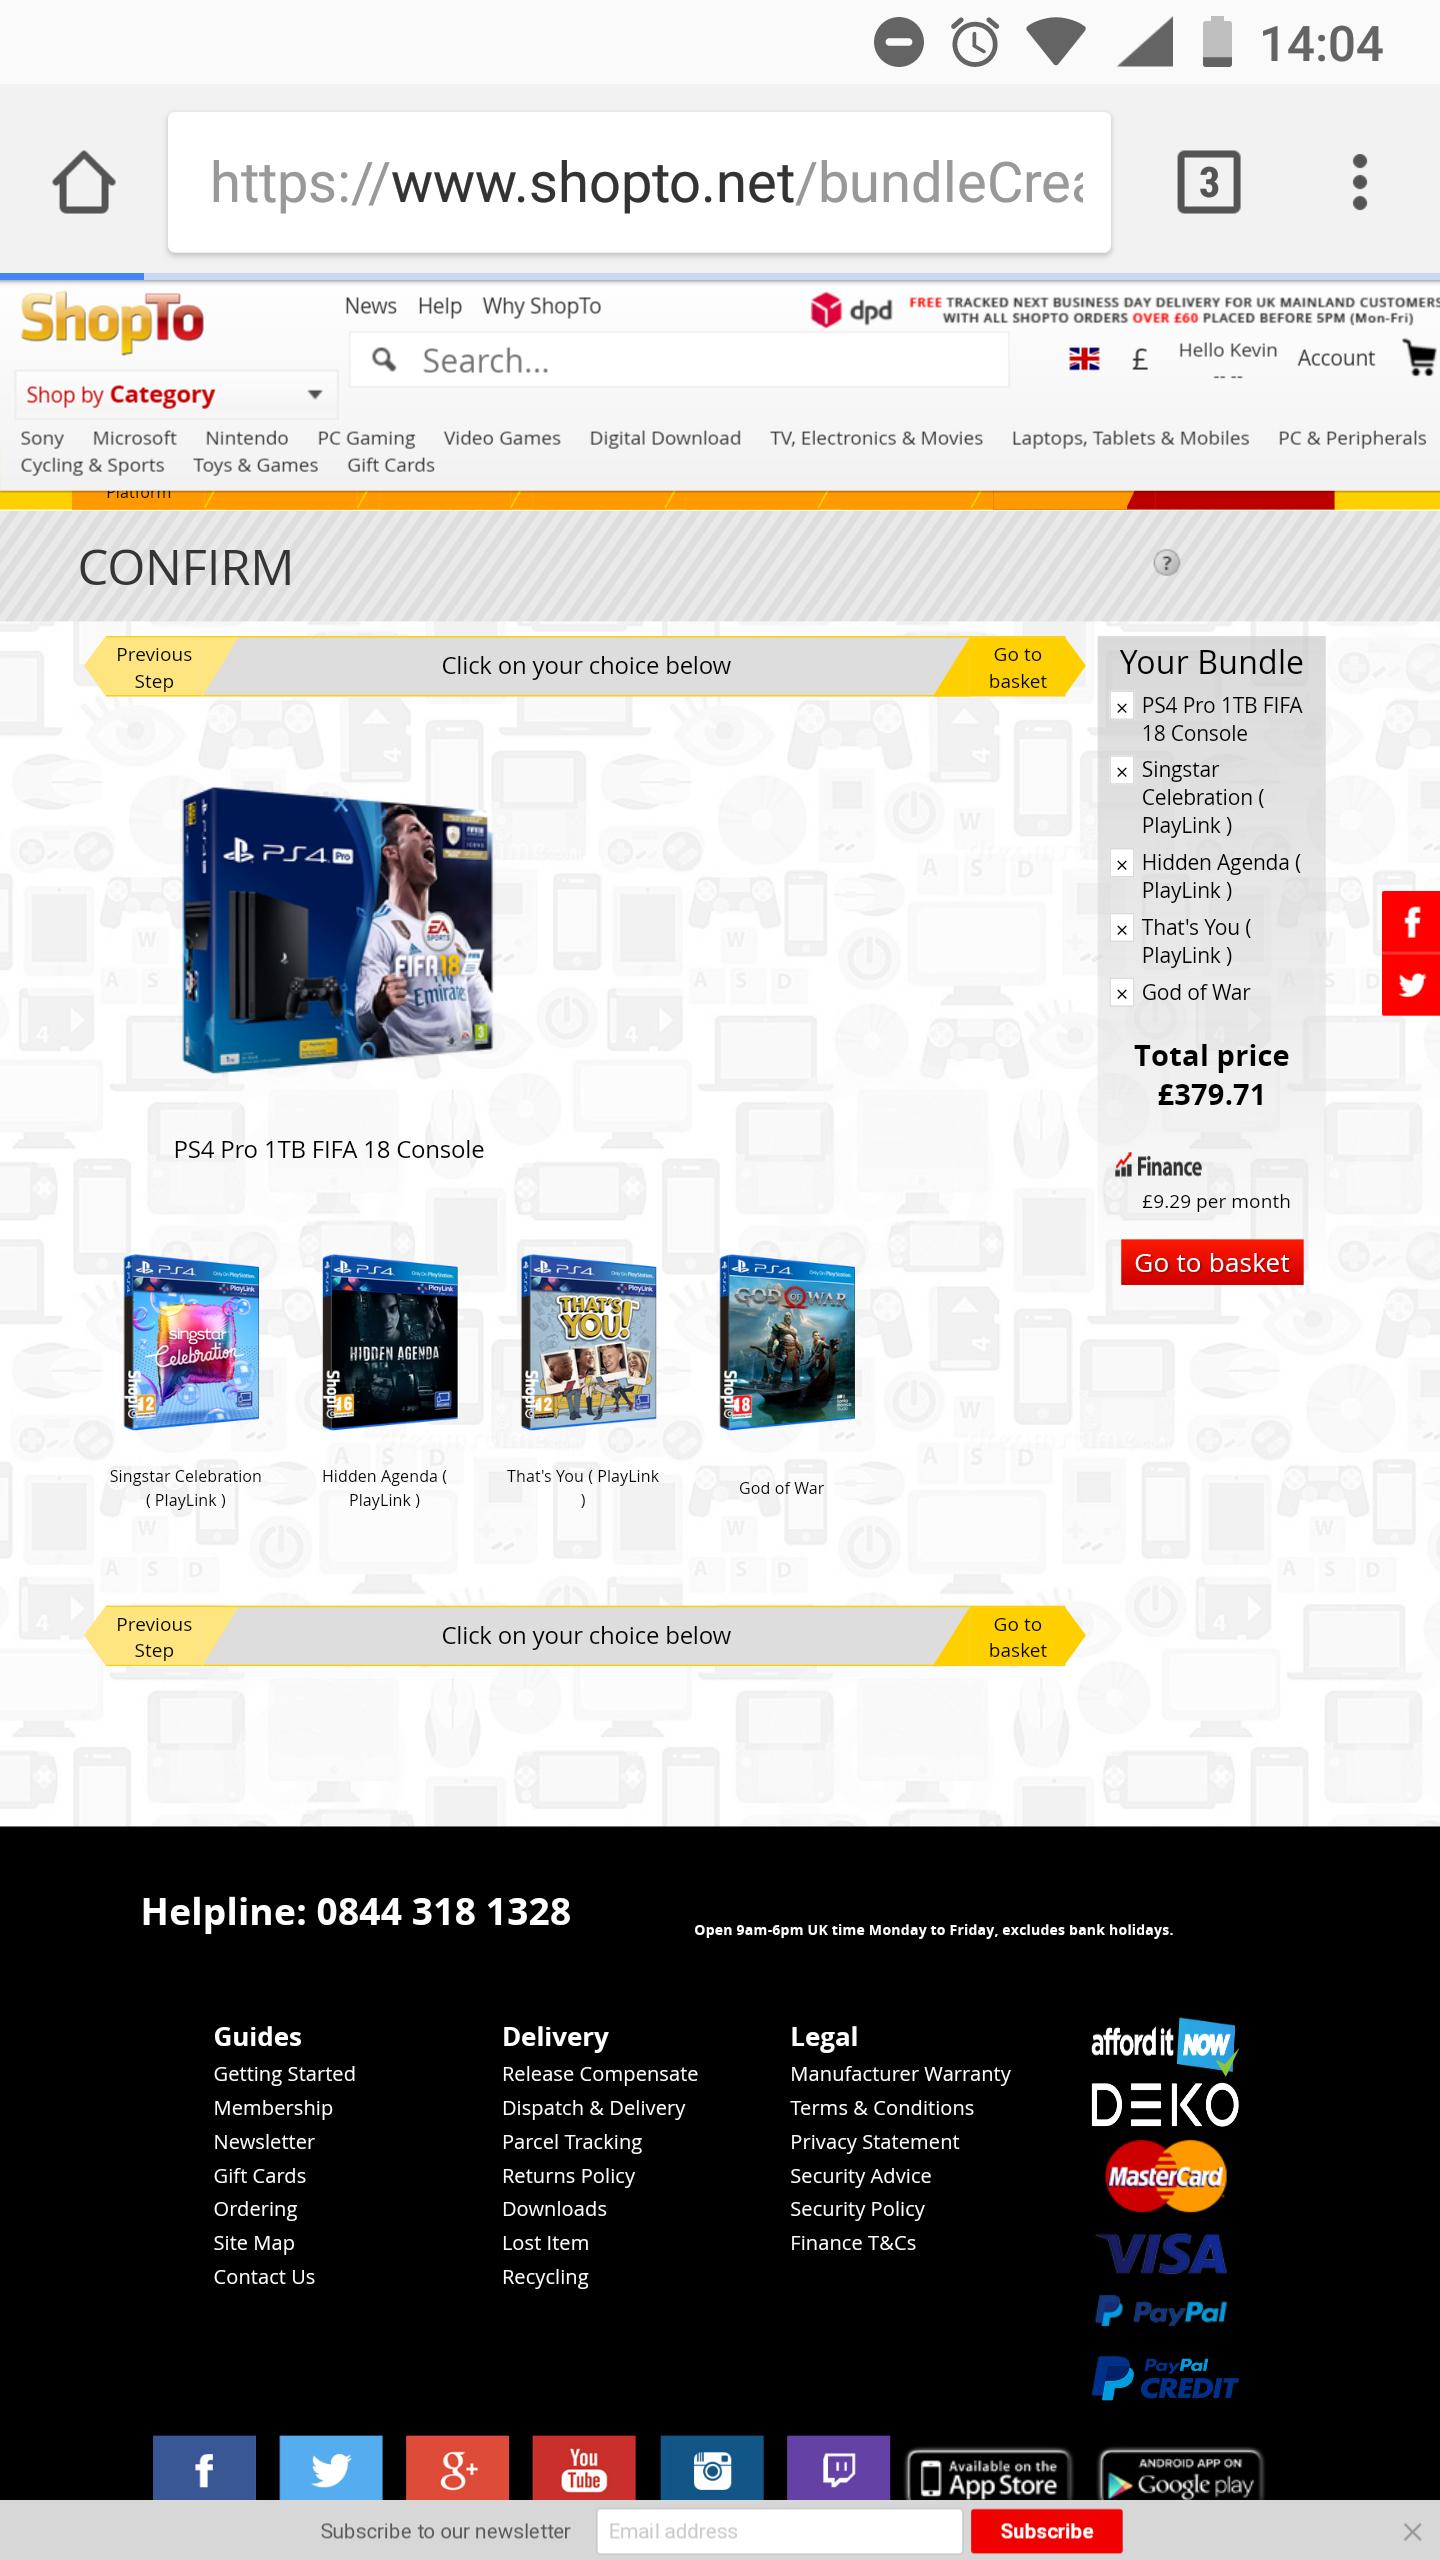 PS4 pro God of War & FIFA18 & 3Games £379.71 @ Shopto